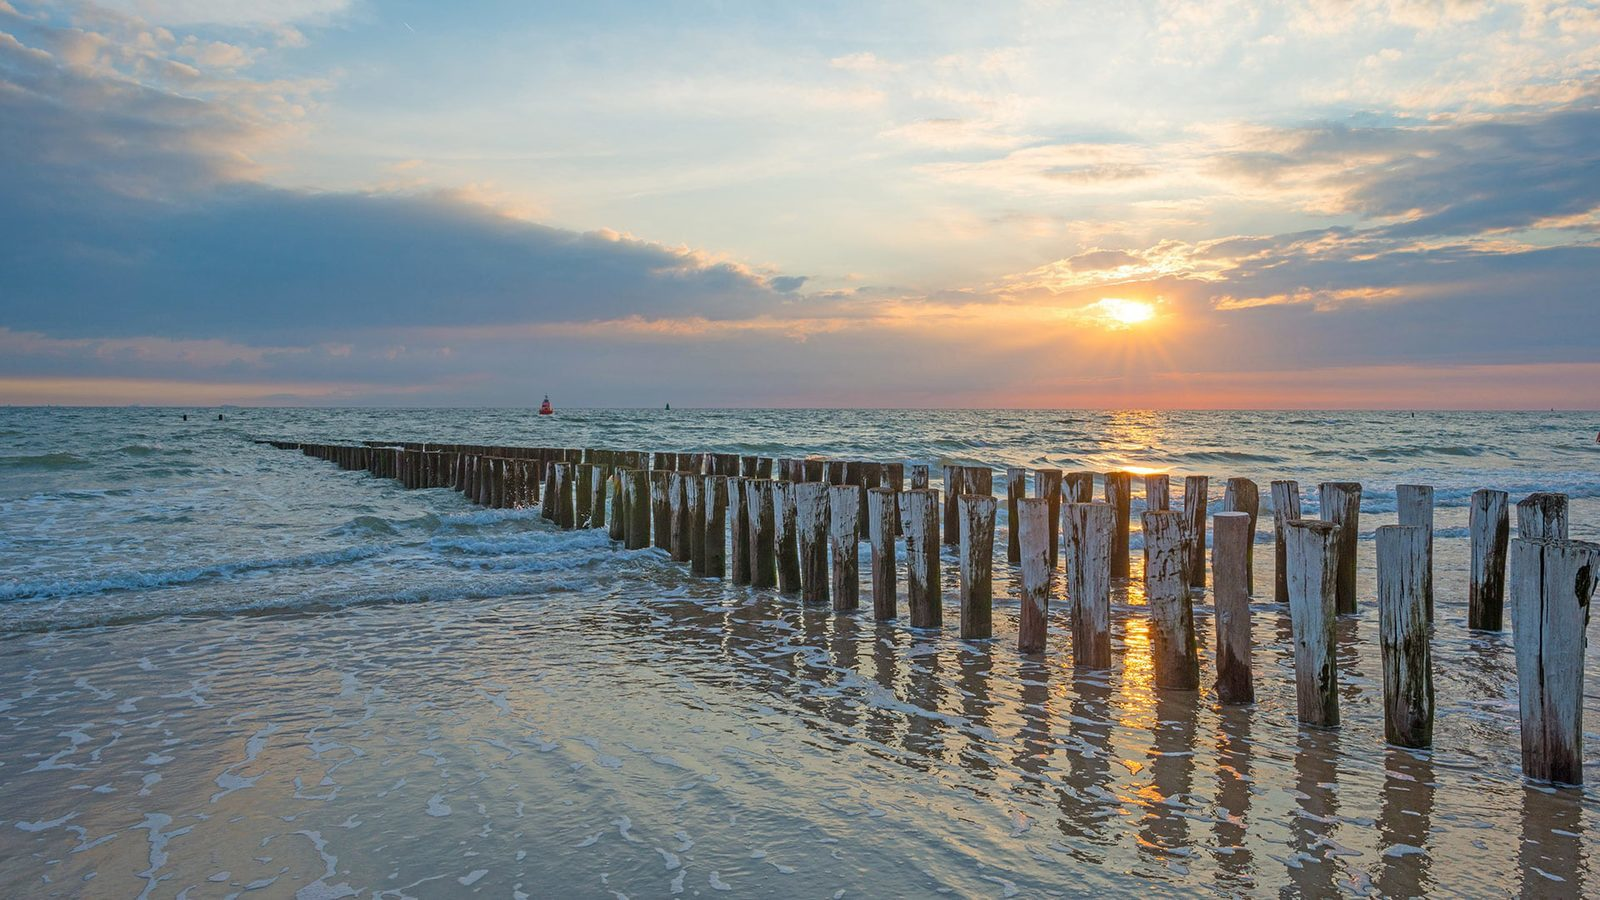 Strand Karte Zeeland.Die 10 Beliebtesten Orte Vakantiezeeland Com